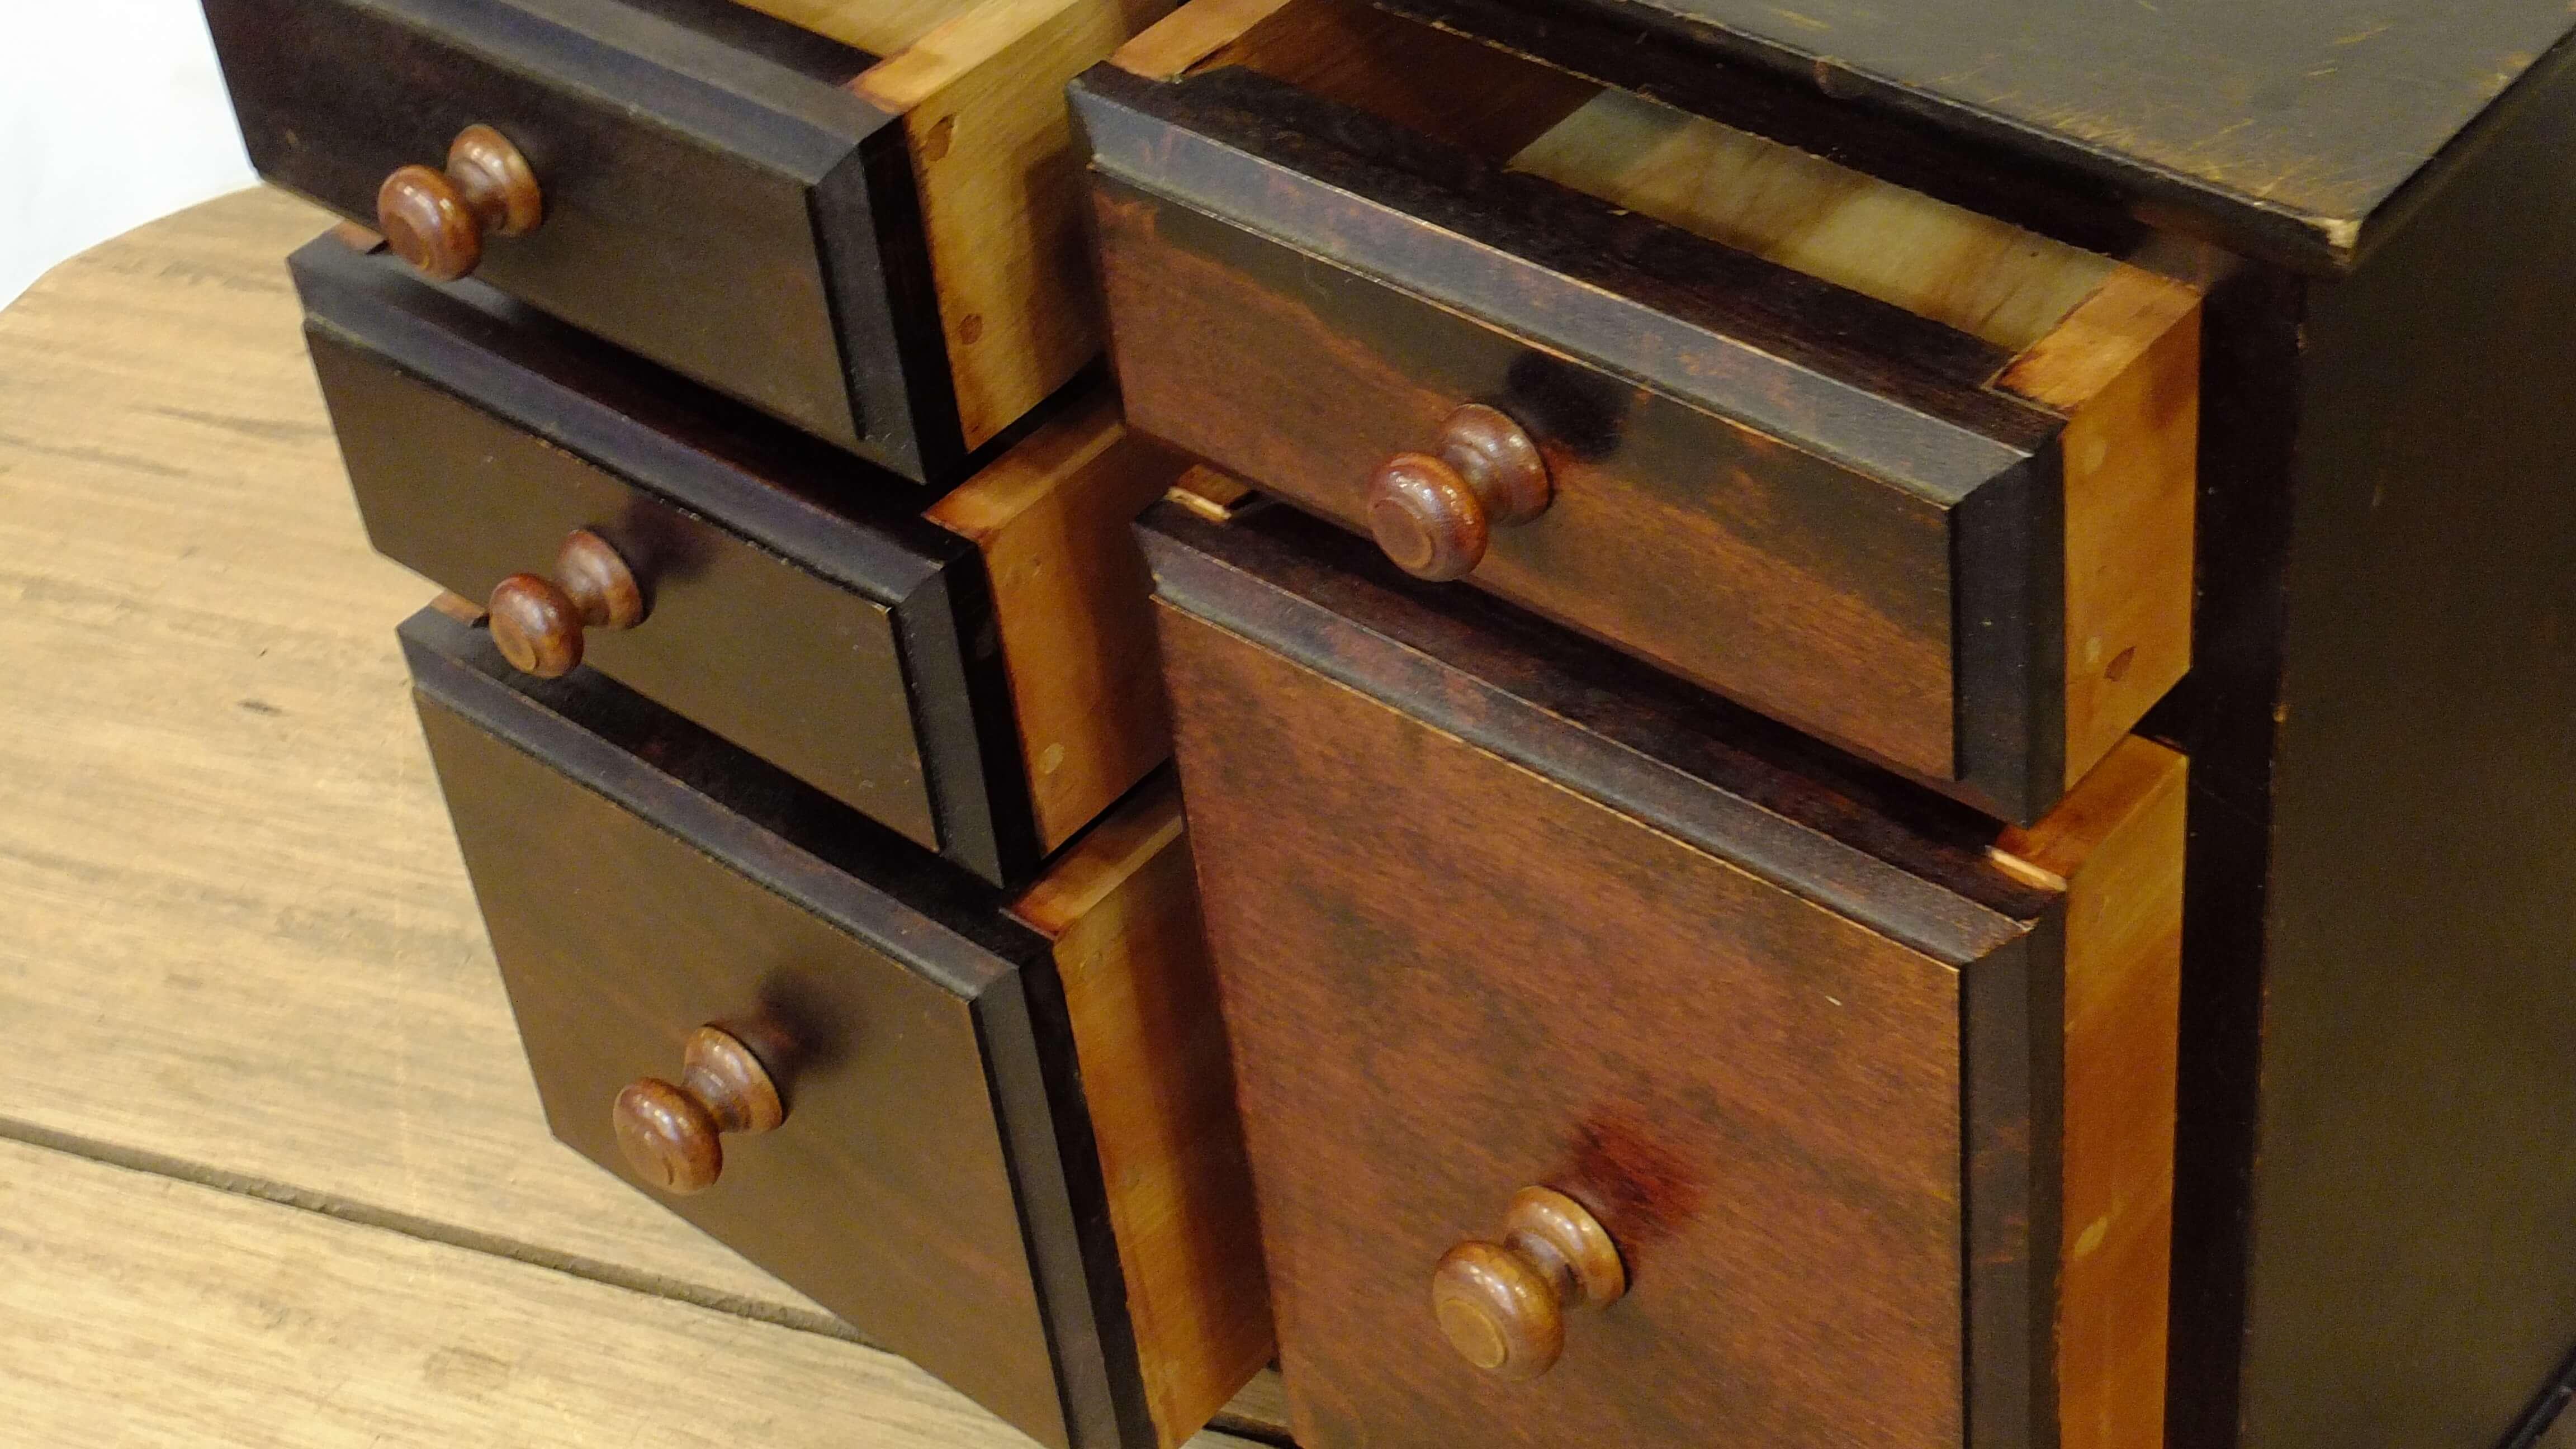 matsumoto mingei small drawer/松本民芸家具 小引き出し 抽斗 ドロワー